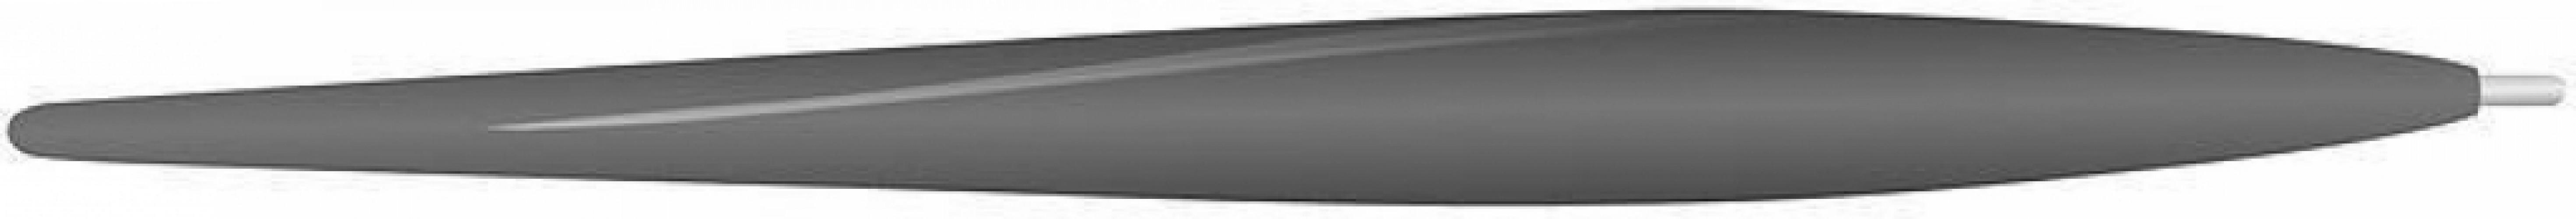 Speedlink Pilot Style Touch Pen (Black) kopen